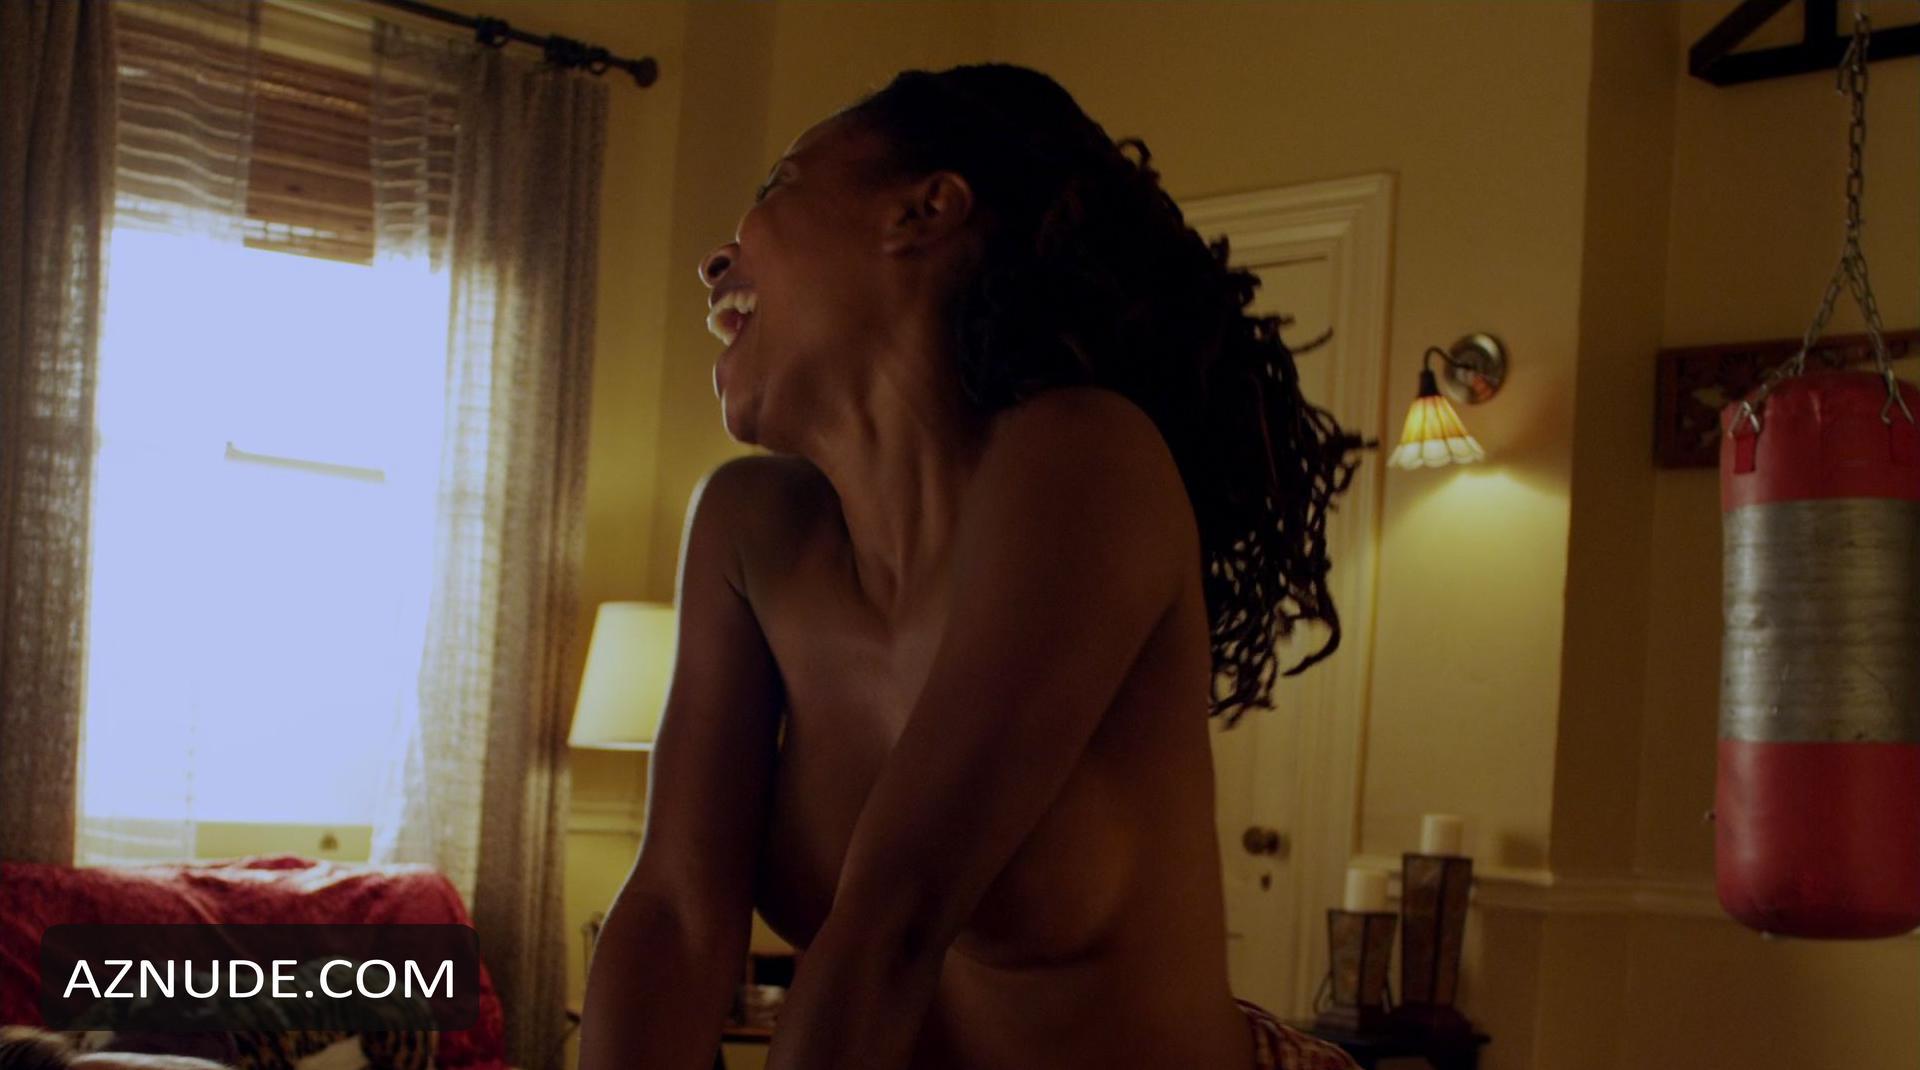 Bianca shameless nude